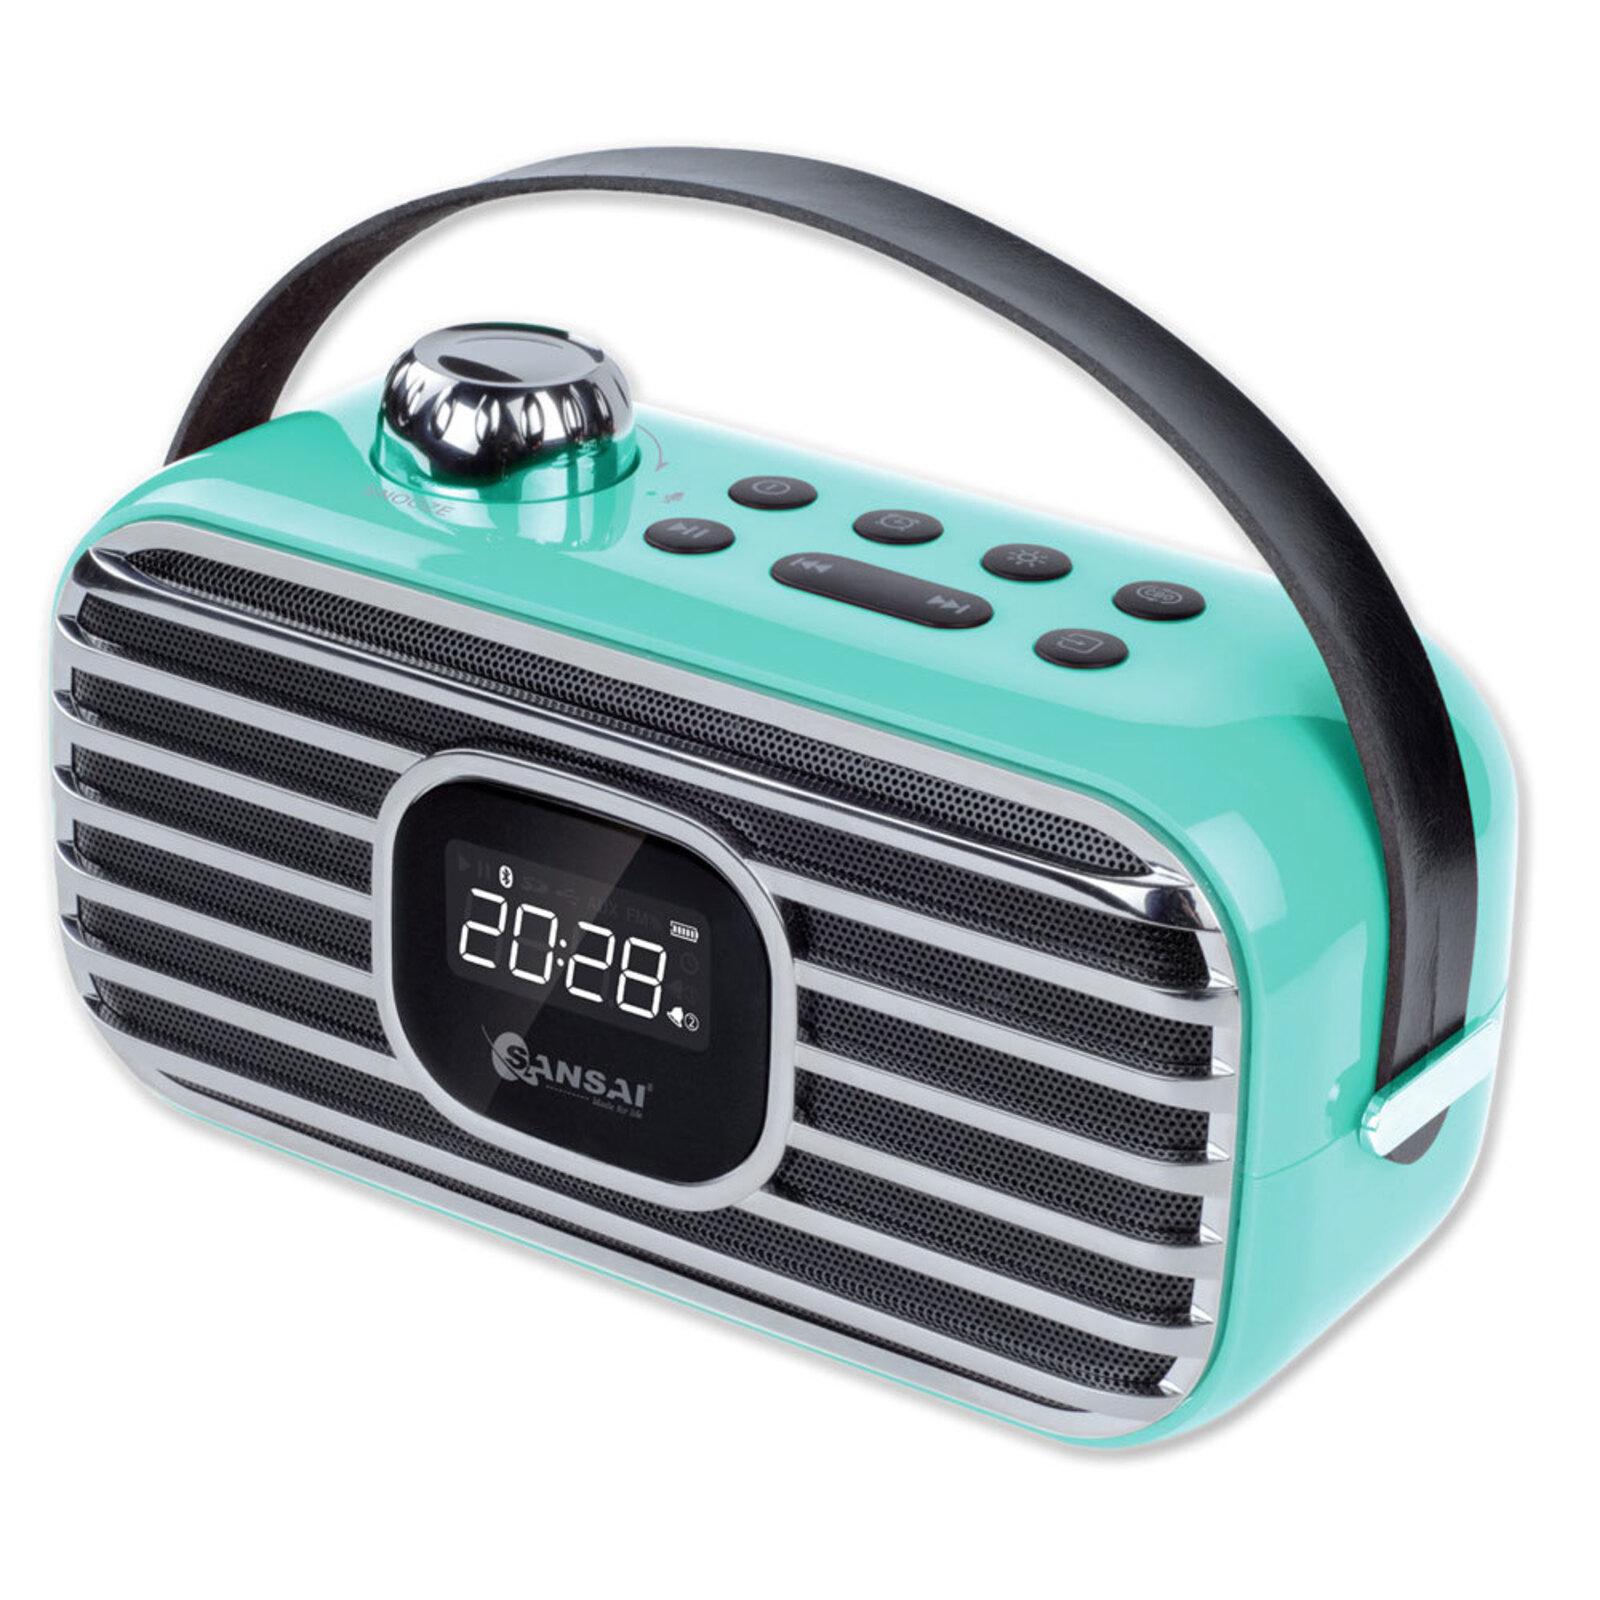 Sansai Portable Wireless Bluetooth Speaker w/ FM Radio/LED Alarm Clock BL